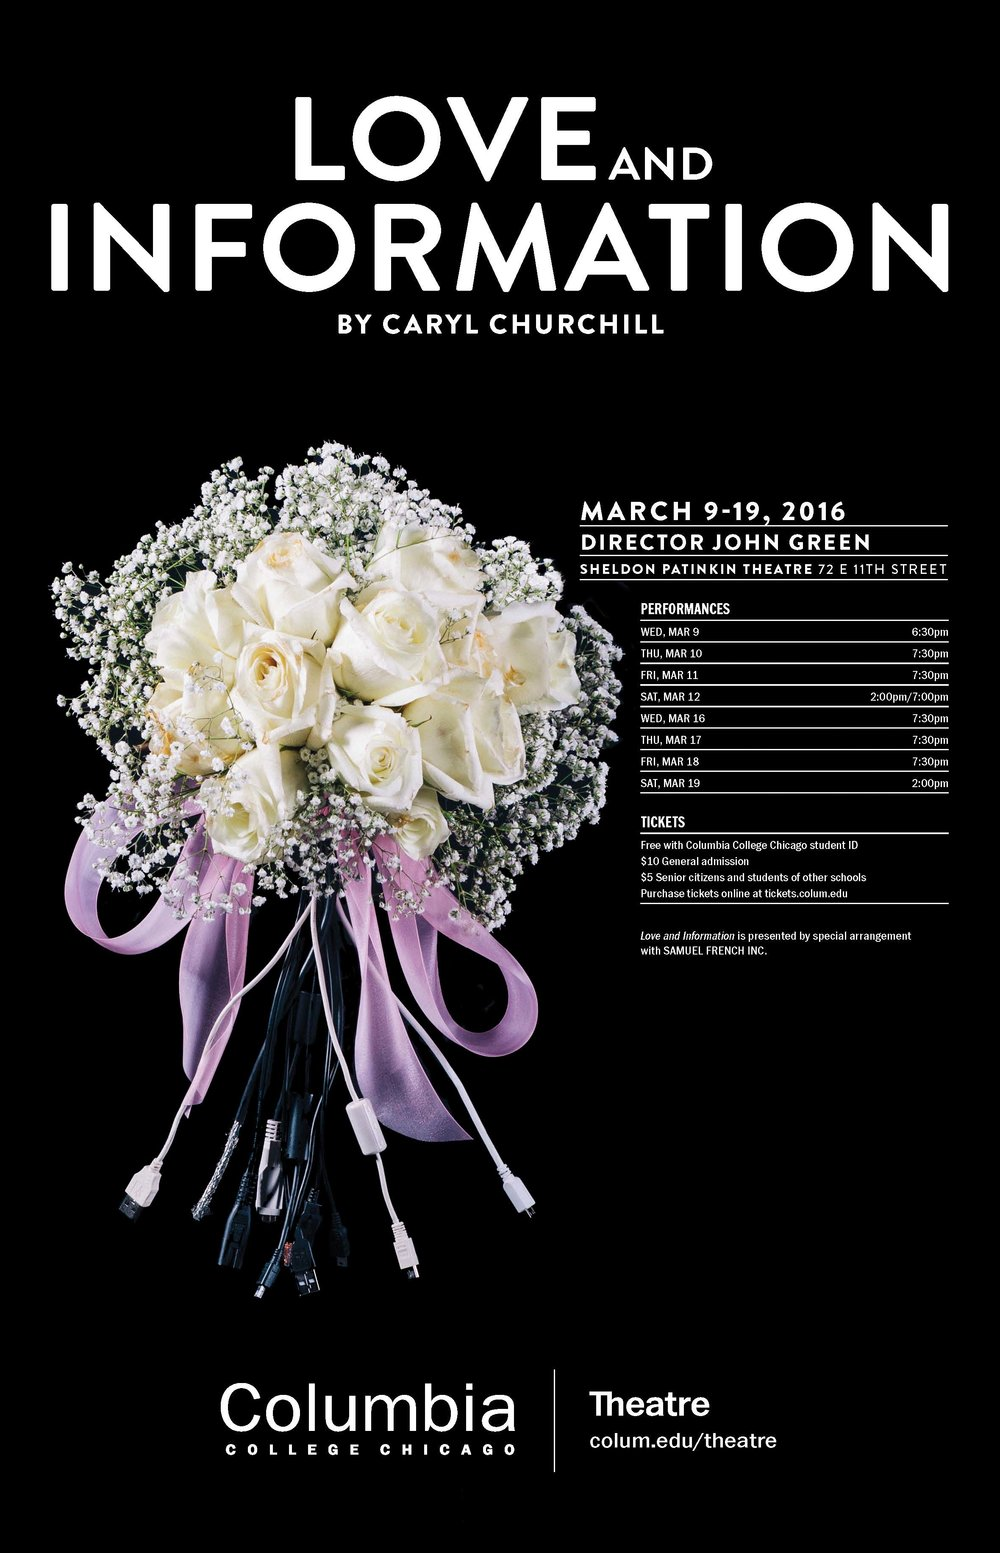 Love-Information-poster.jpg